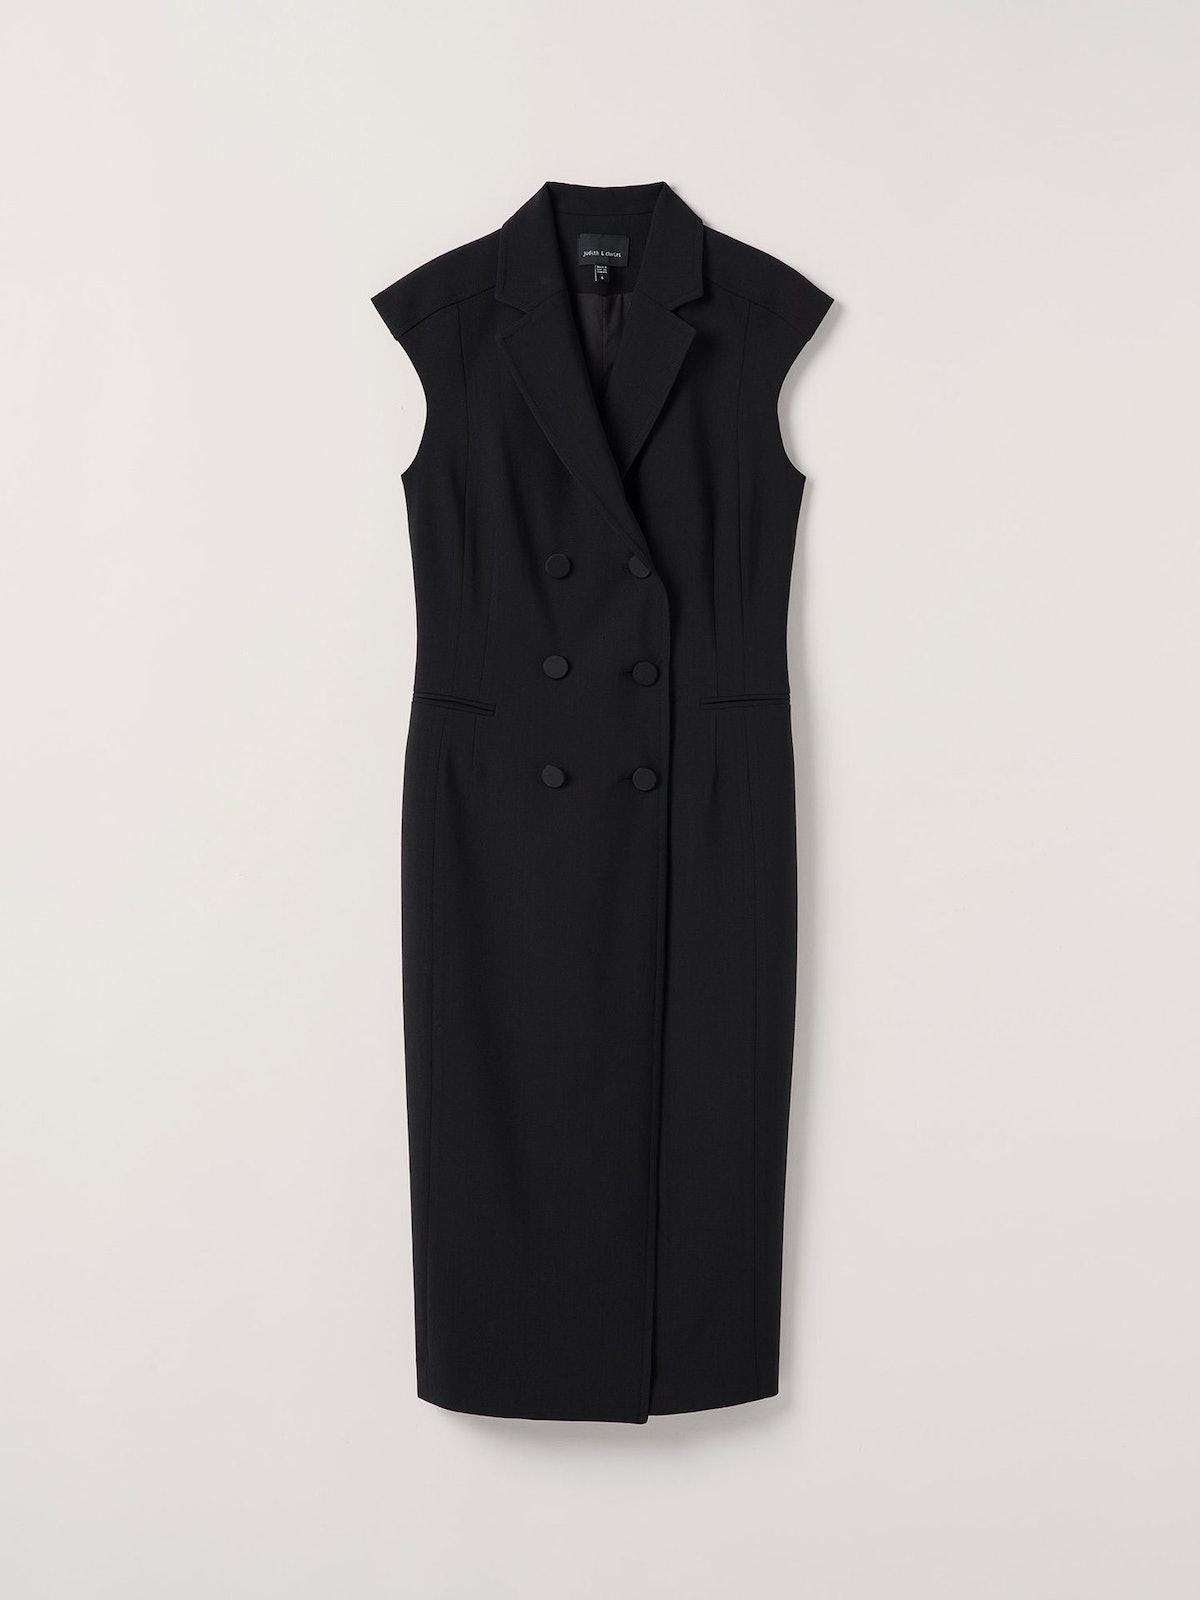 Sorbonne Dress